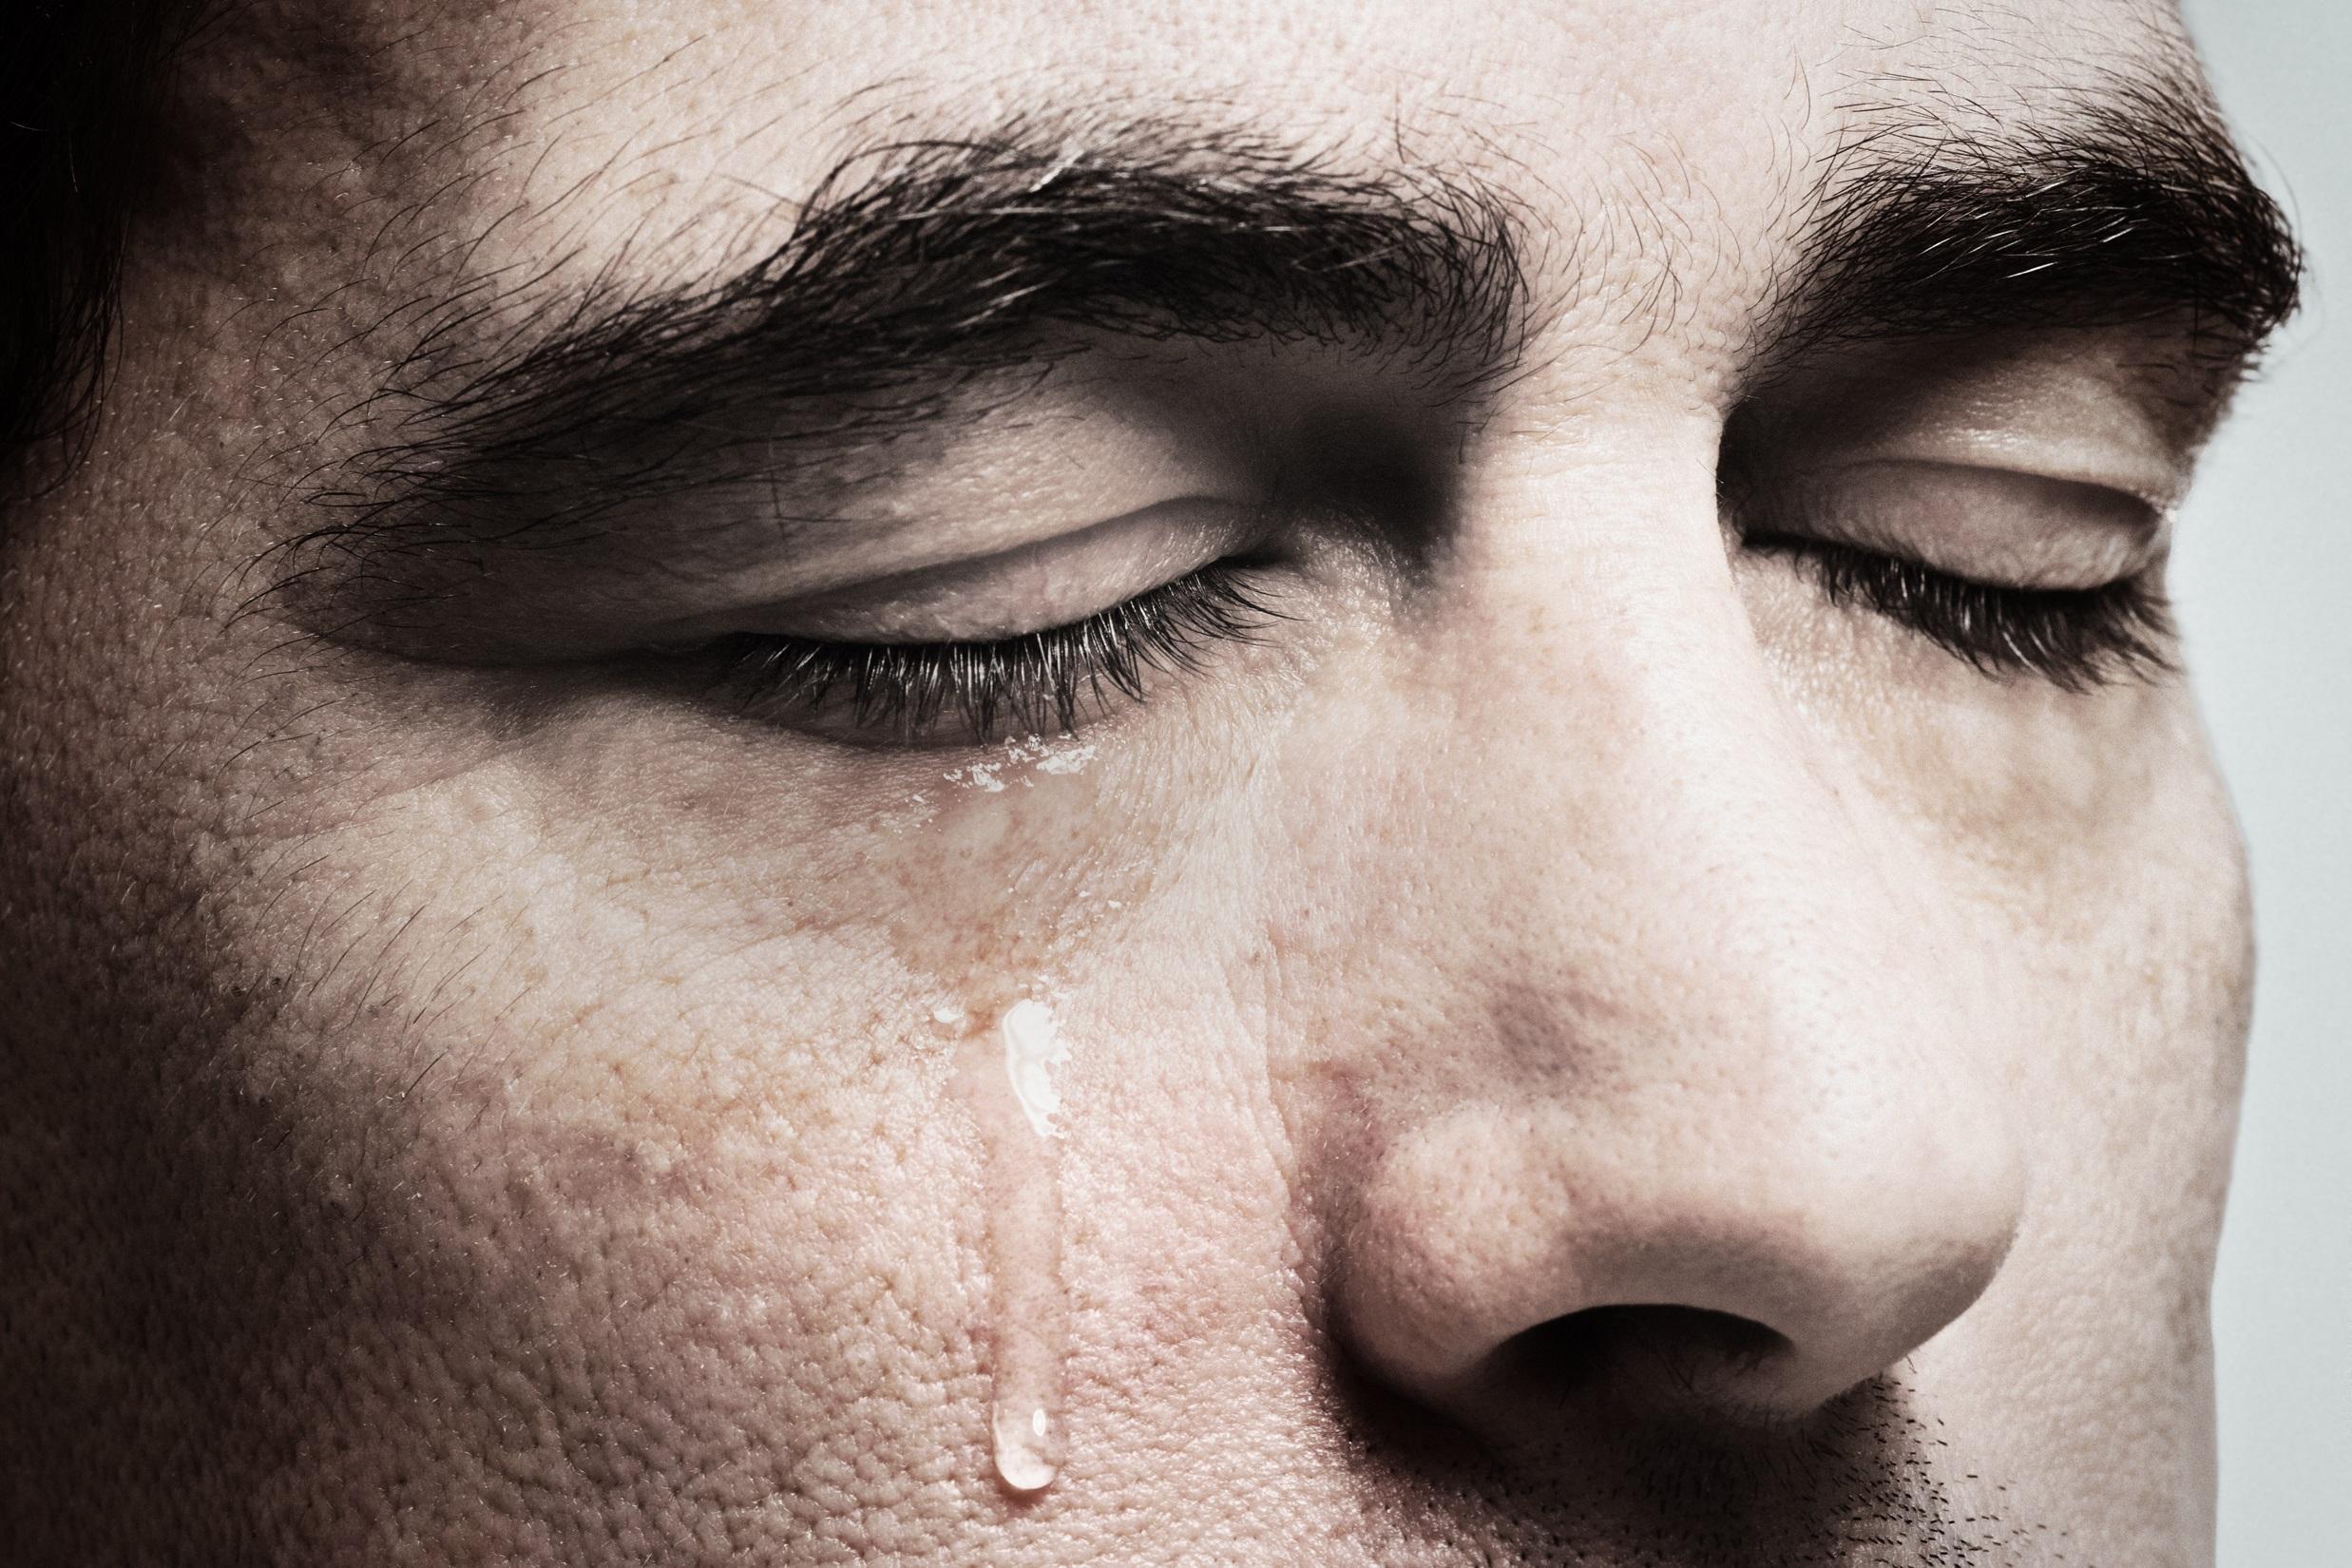 gurbette ağlama ile ilgili görsel sonucu